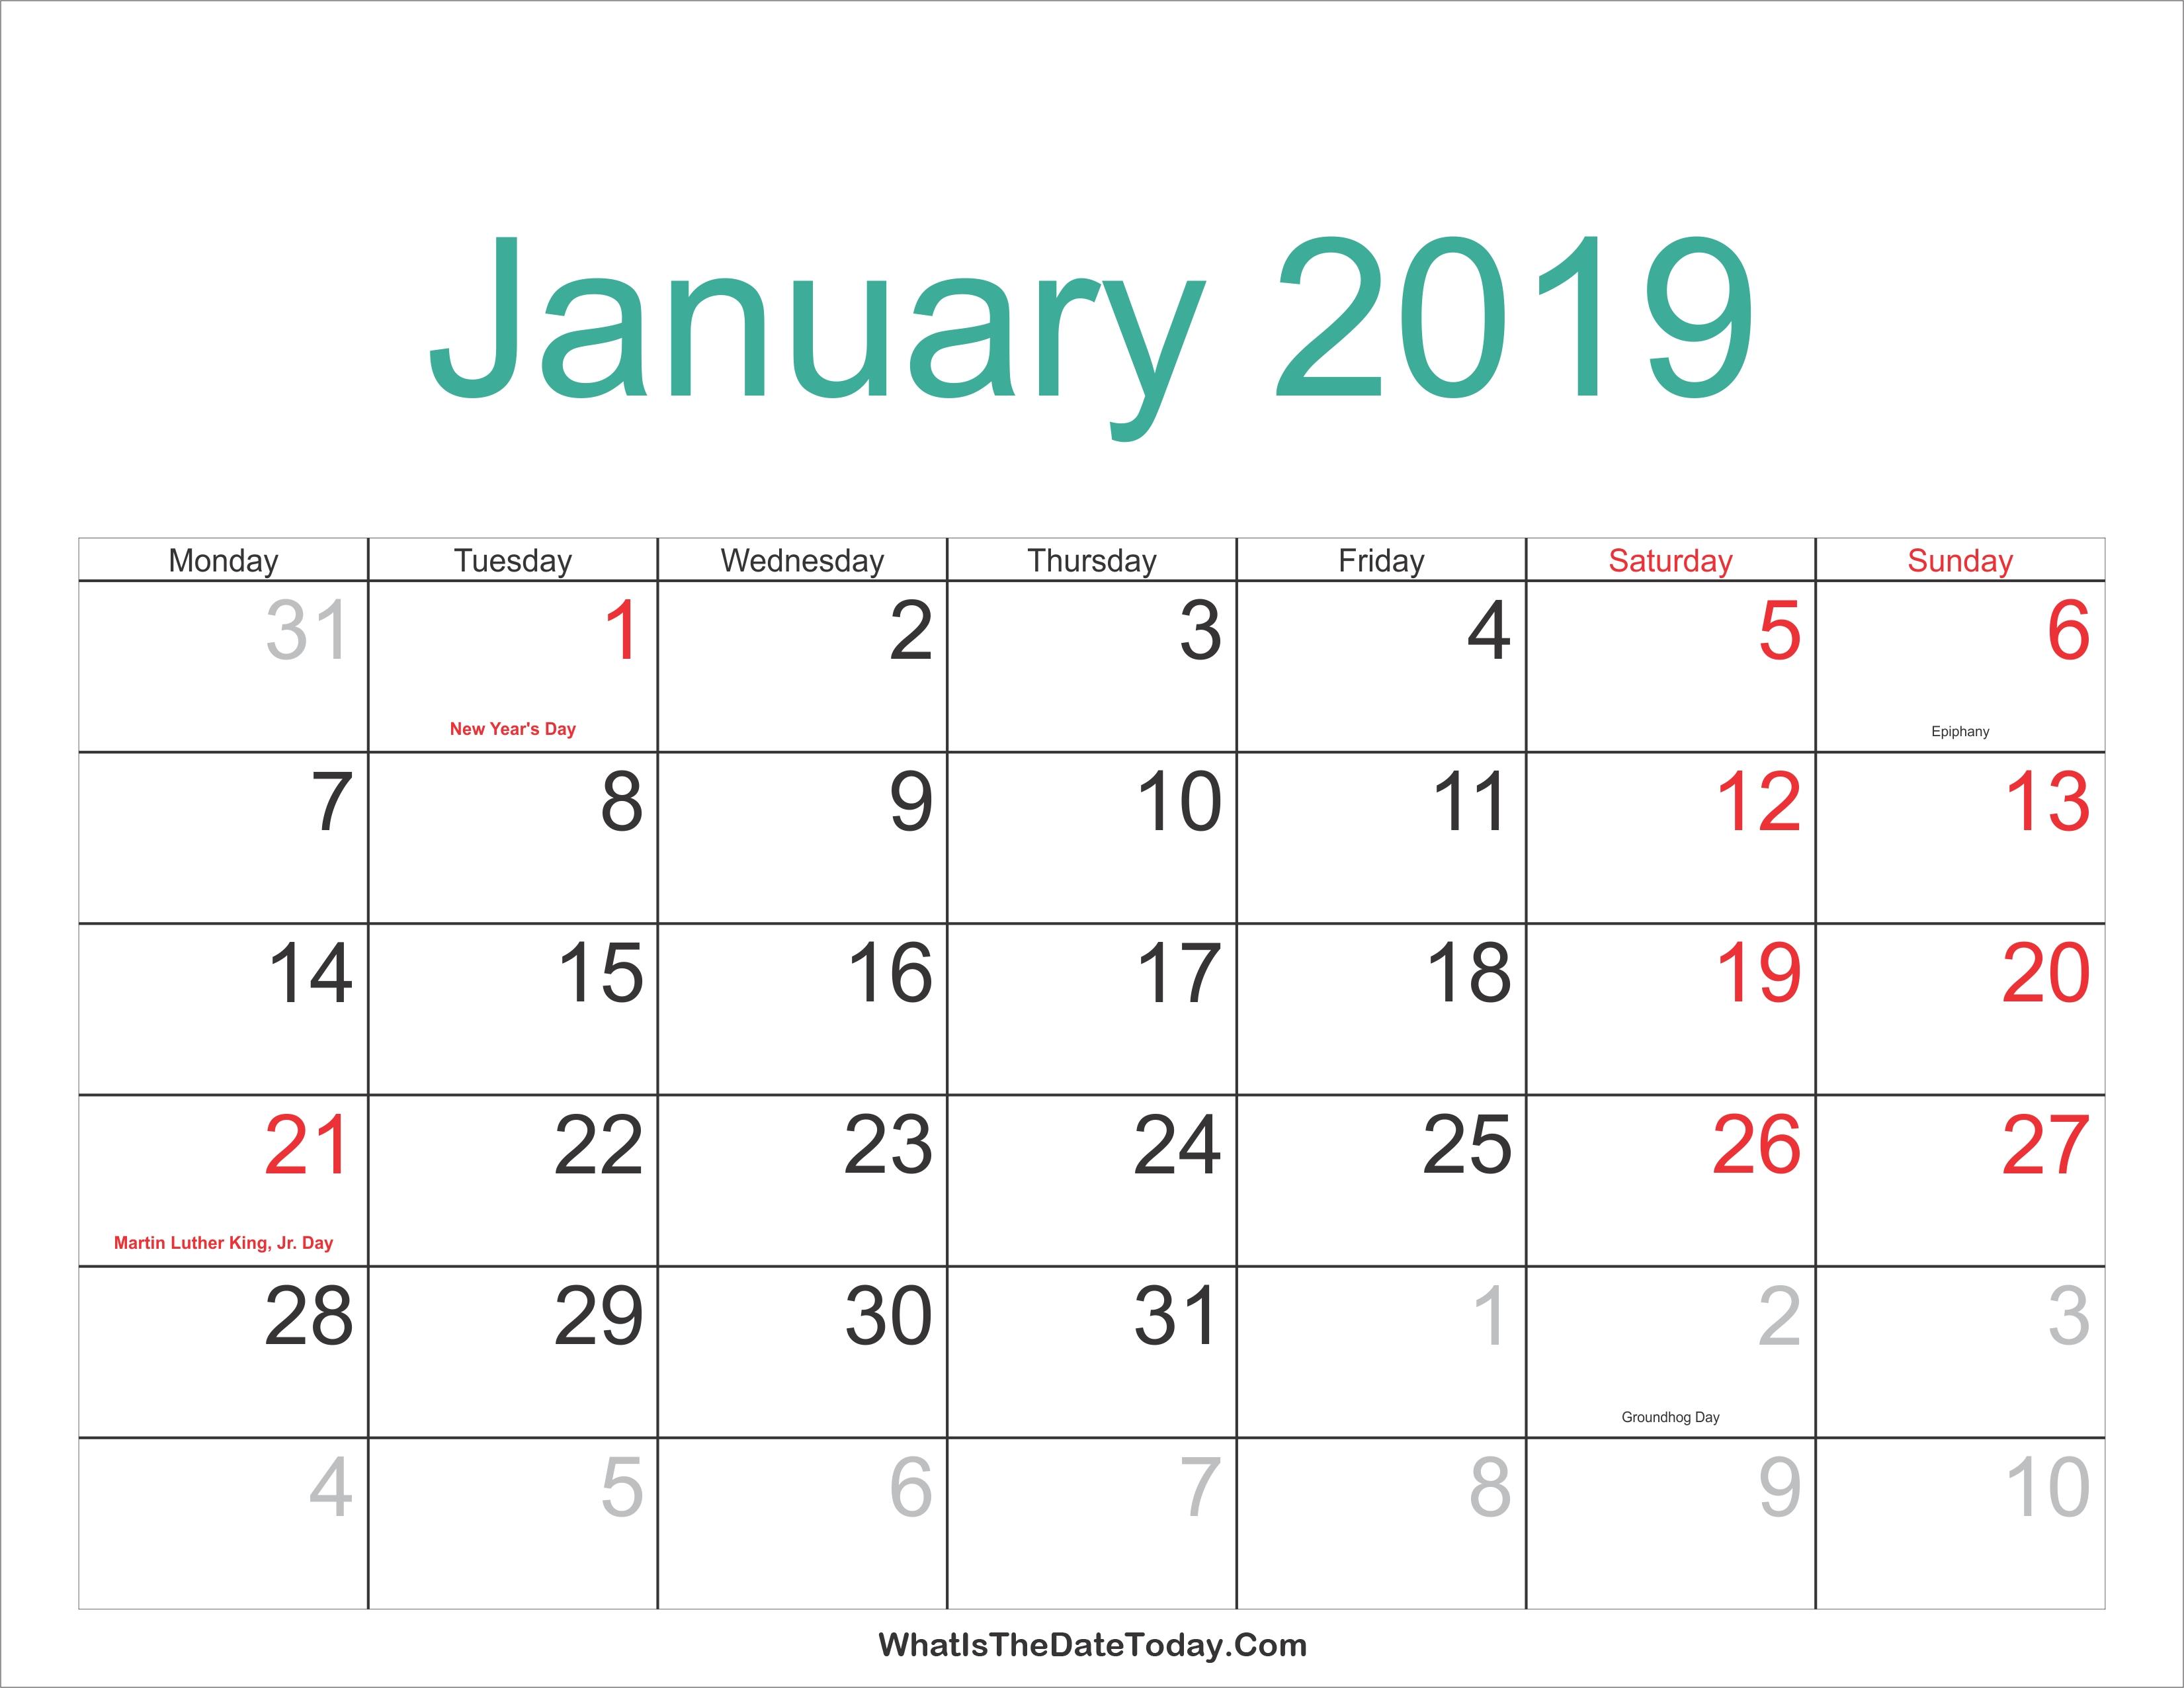 January 2019 Calendar Holidays January 9 2019 Calendar